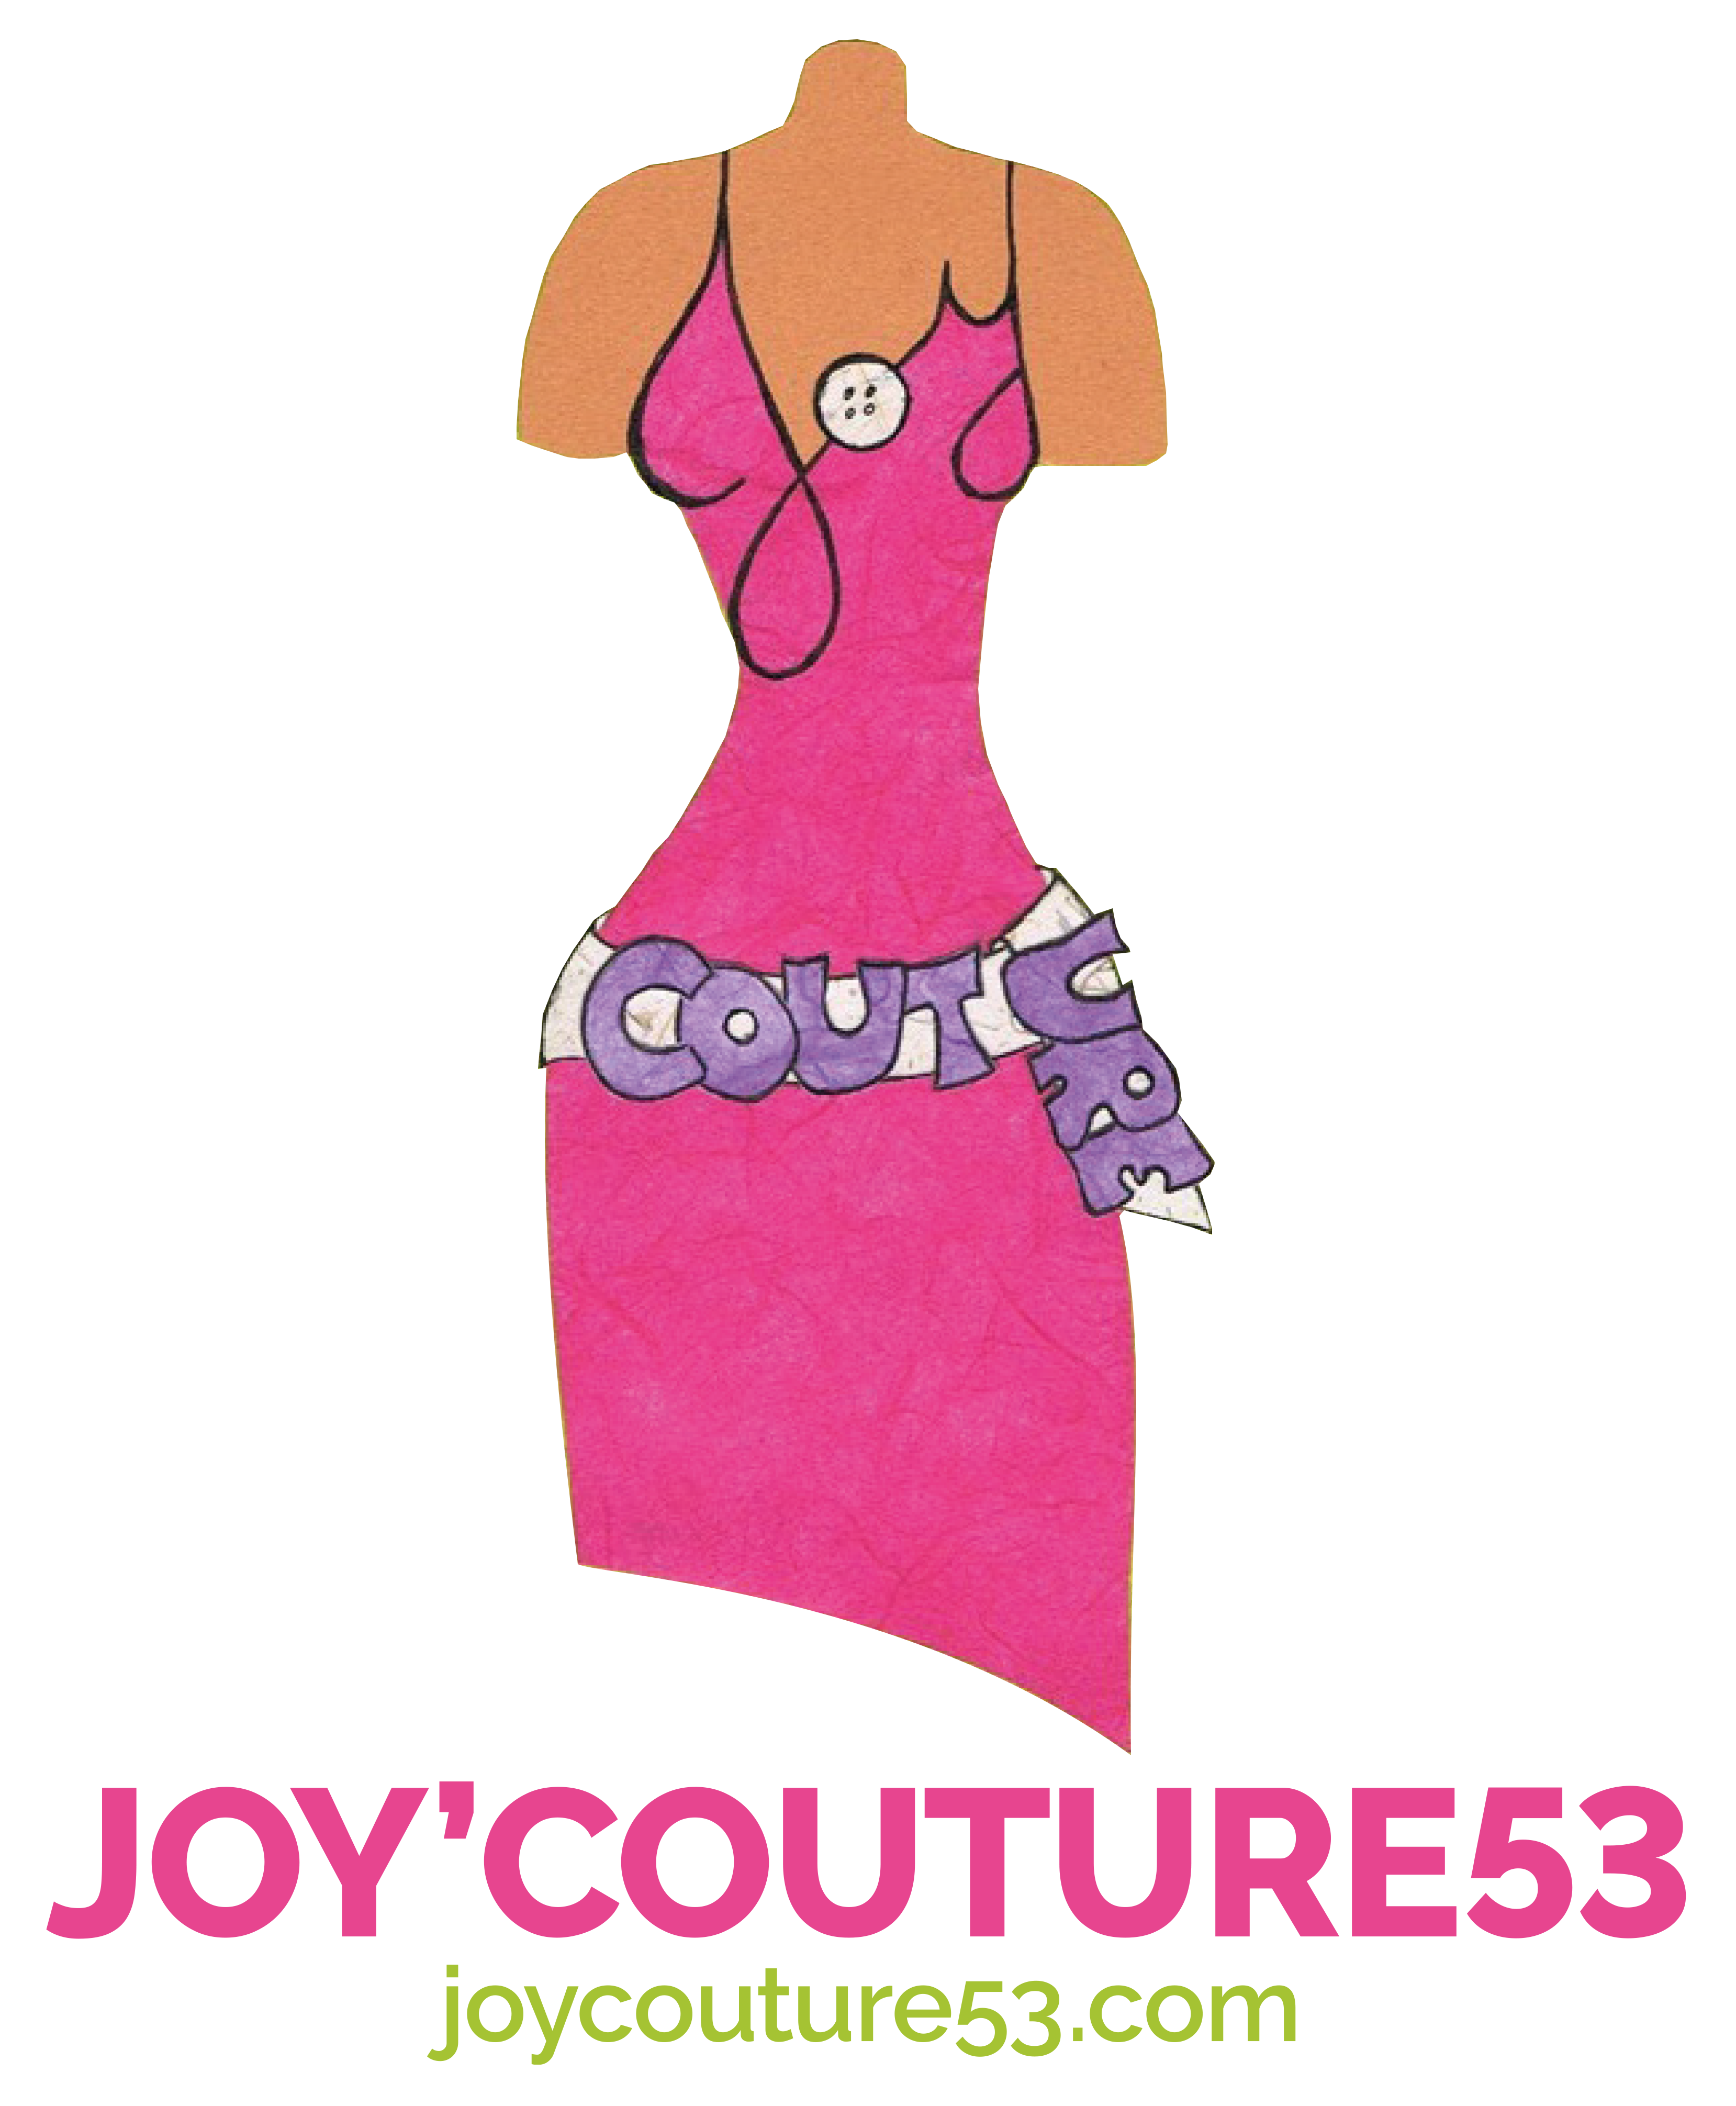 Joy'Couture53 Logo